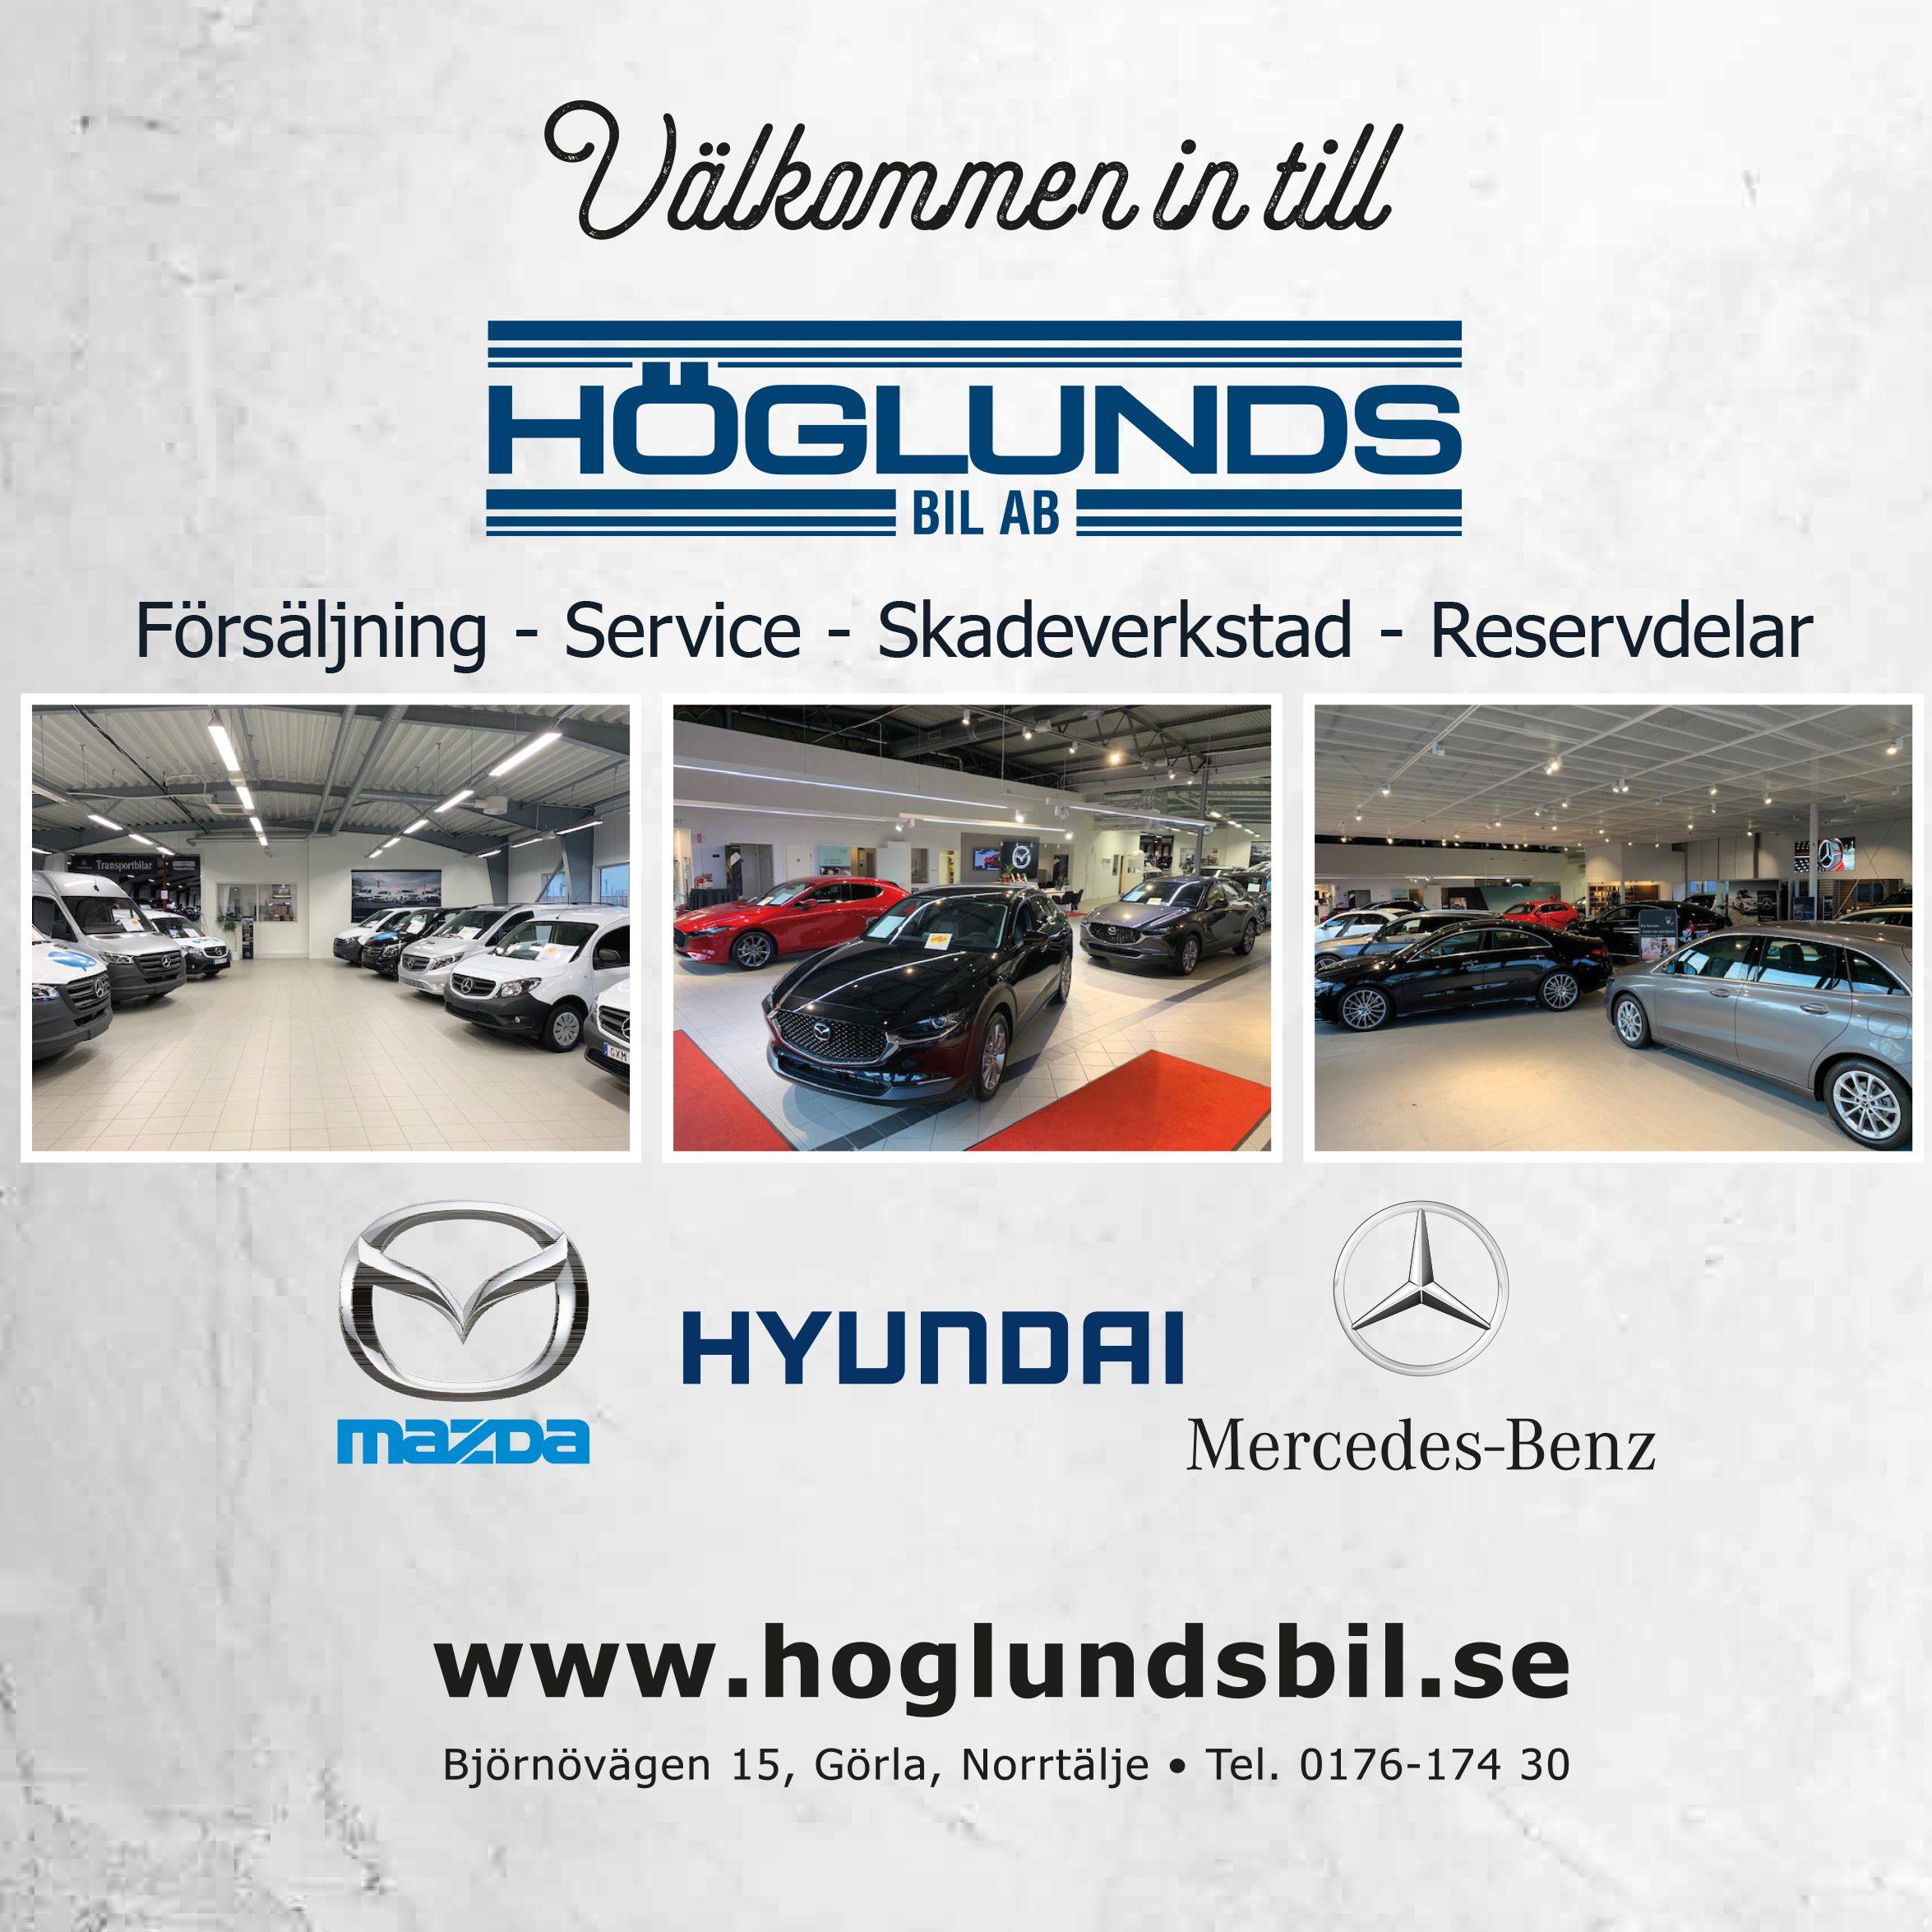 Hoglunds_2021_2